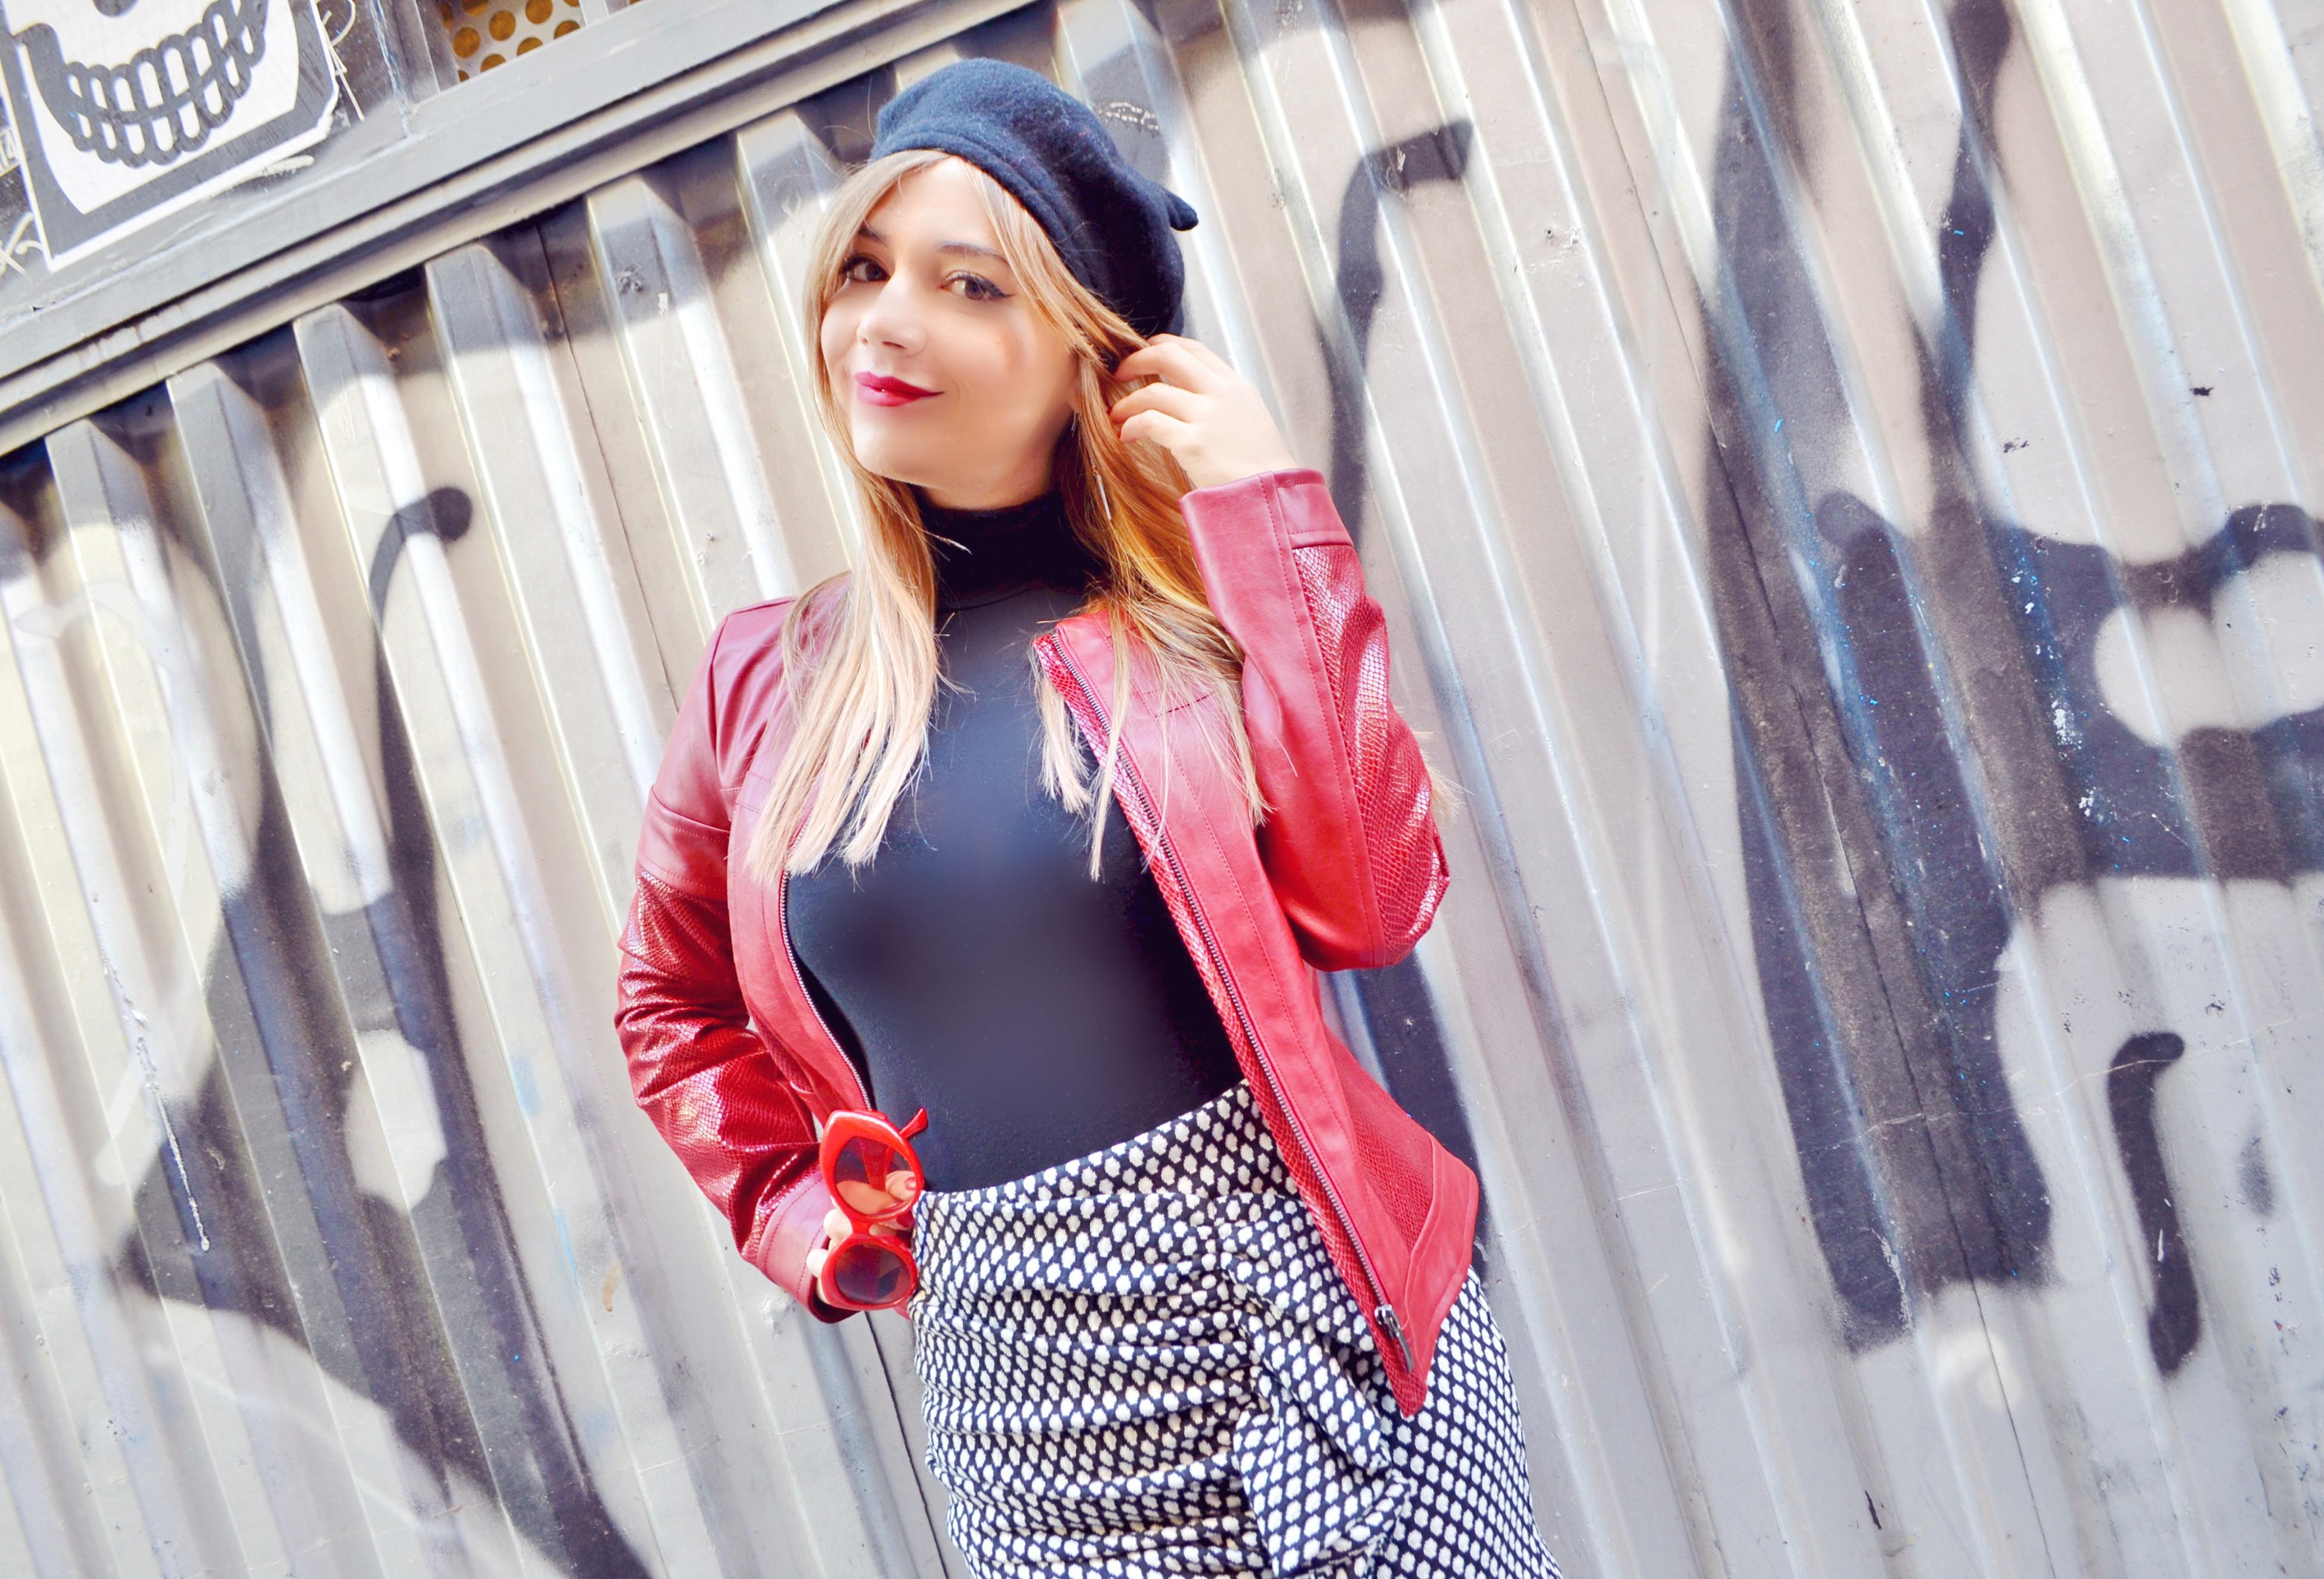 Blog-de-moda-fashionista-ChicAdicta-influencer-Chic-Adicta-Madrid-street-style-chupa-roja-arggido-PiensaenChic-Piensa-en-Chic